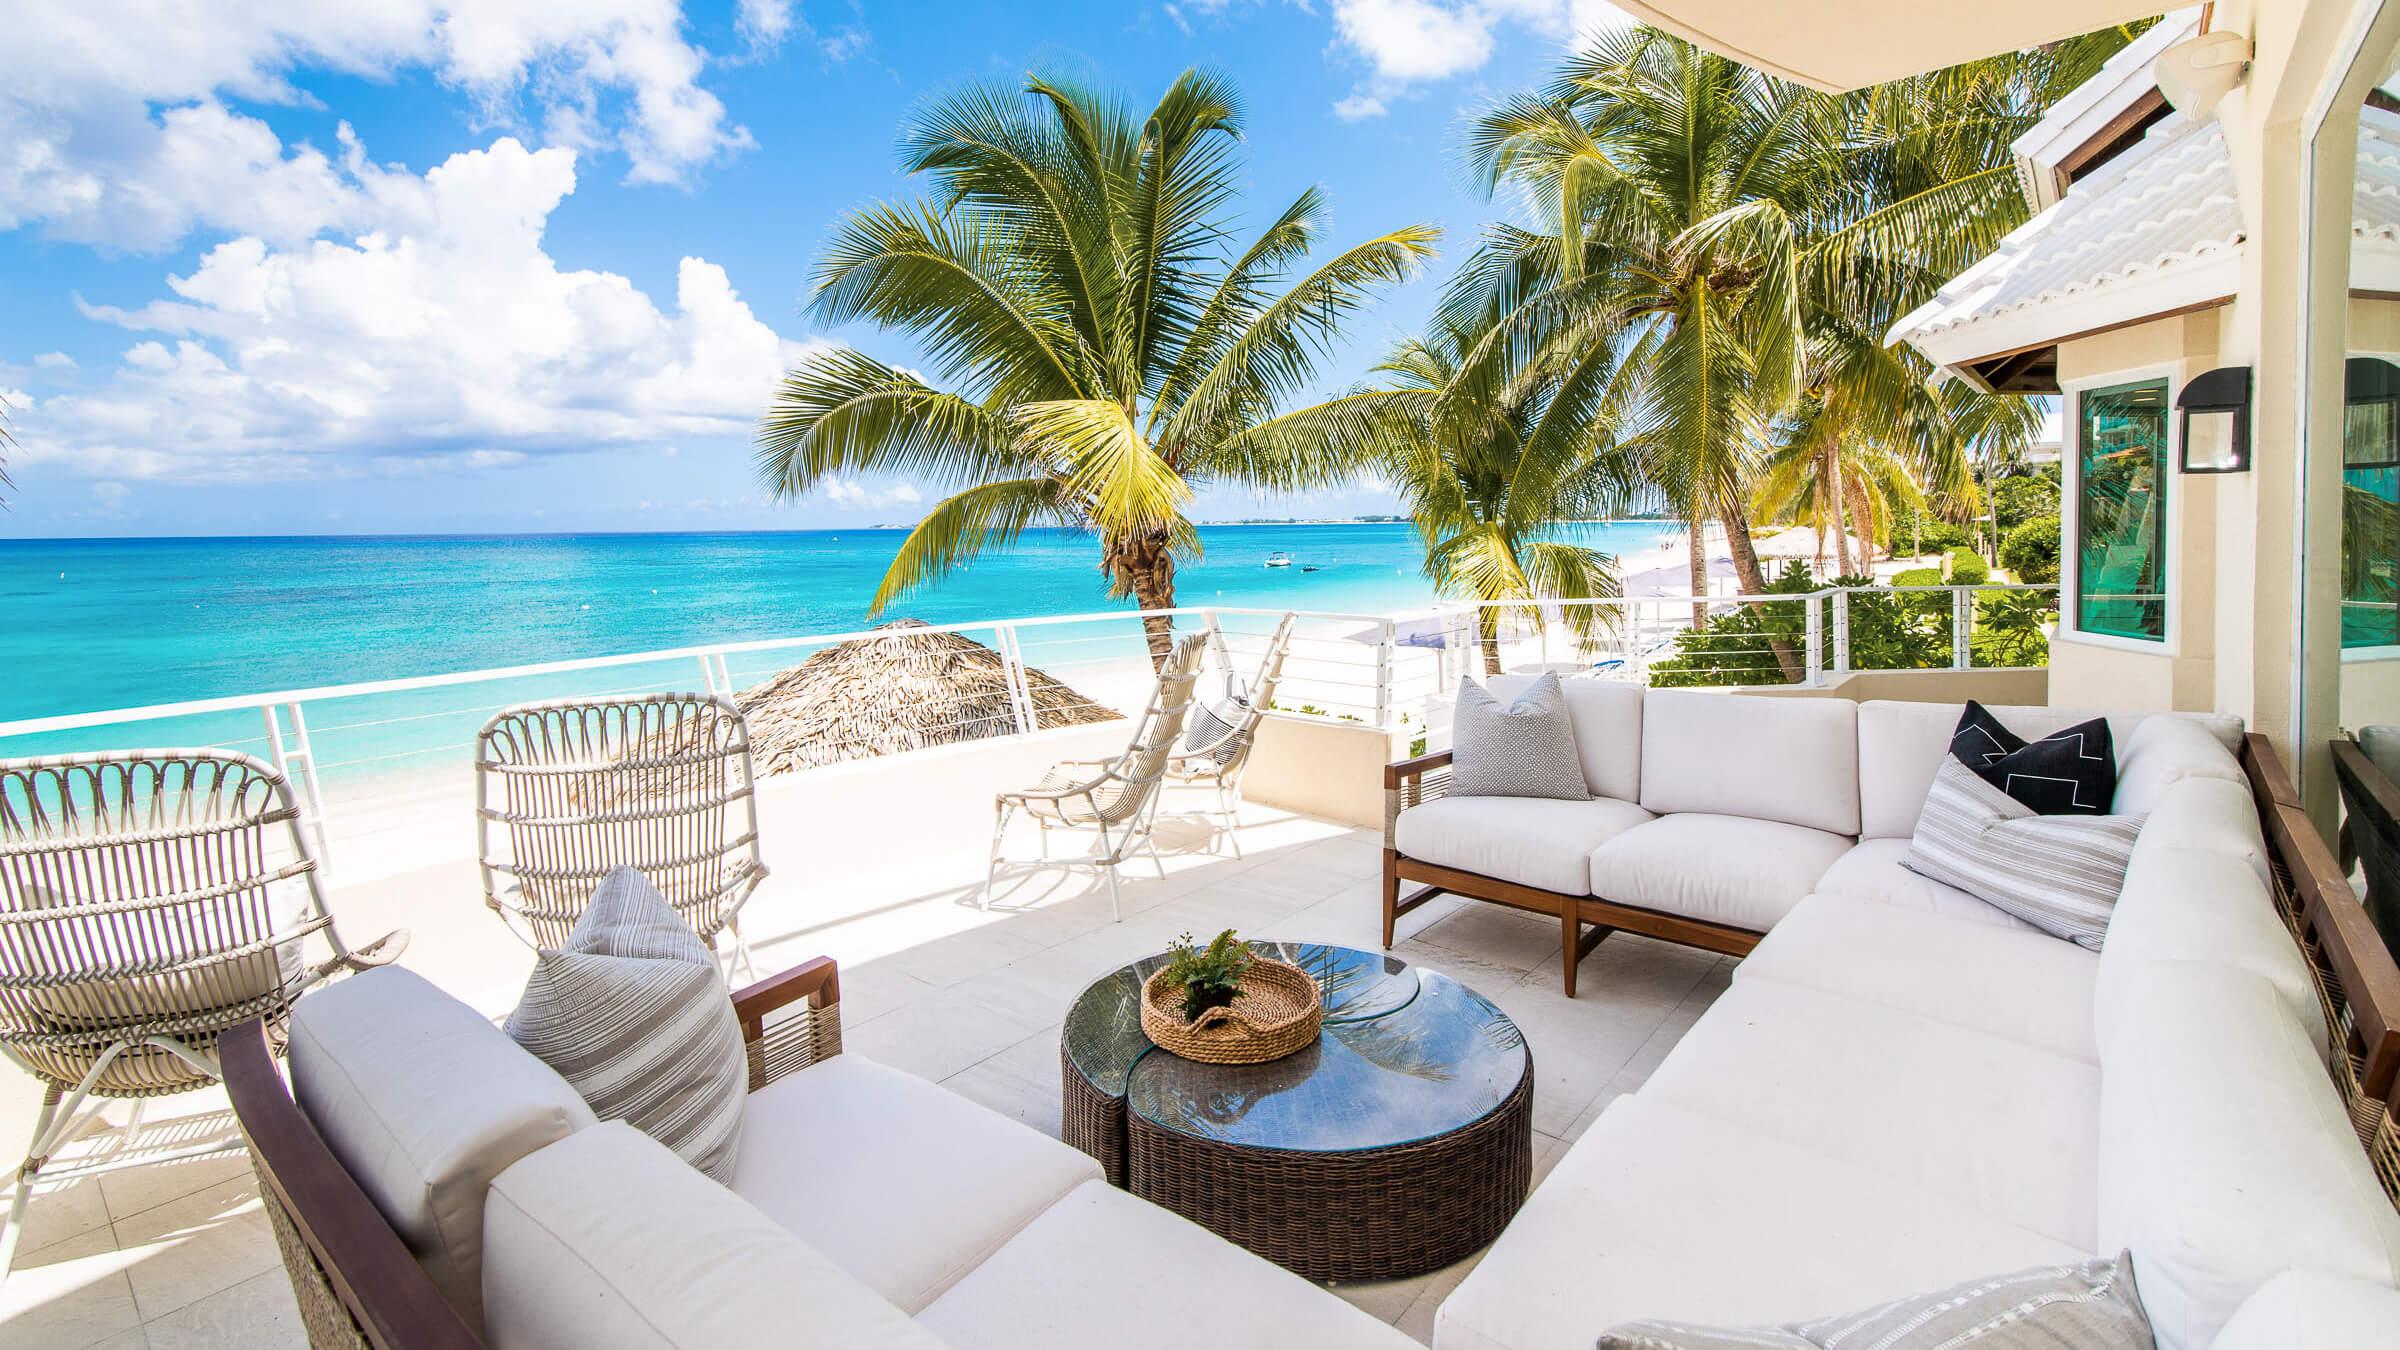 Seascape-Villa-Beach-Villa-Cayman-Islands-Grand-Cayman-Paradise-Balcony-Outdoor-Lounge-Chairs-and-Seating-Area.jpg